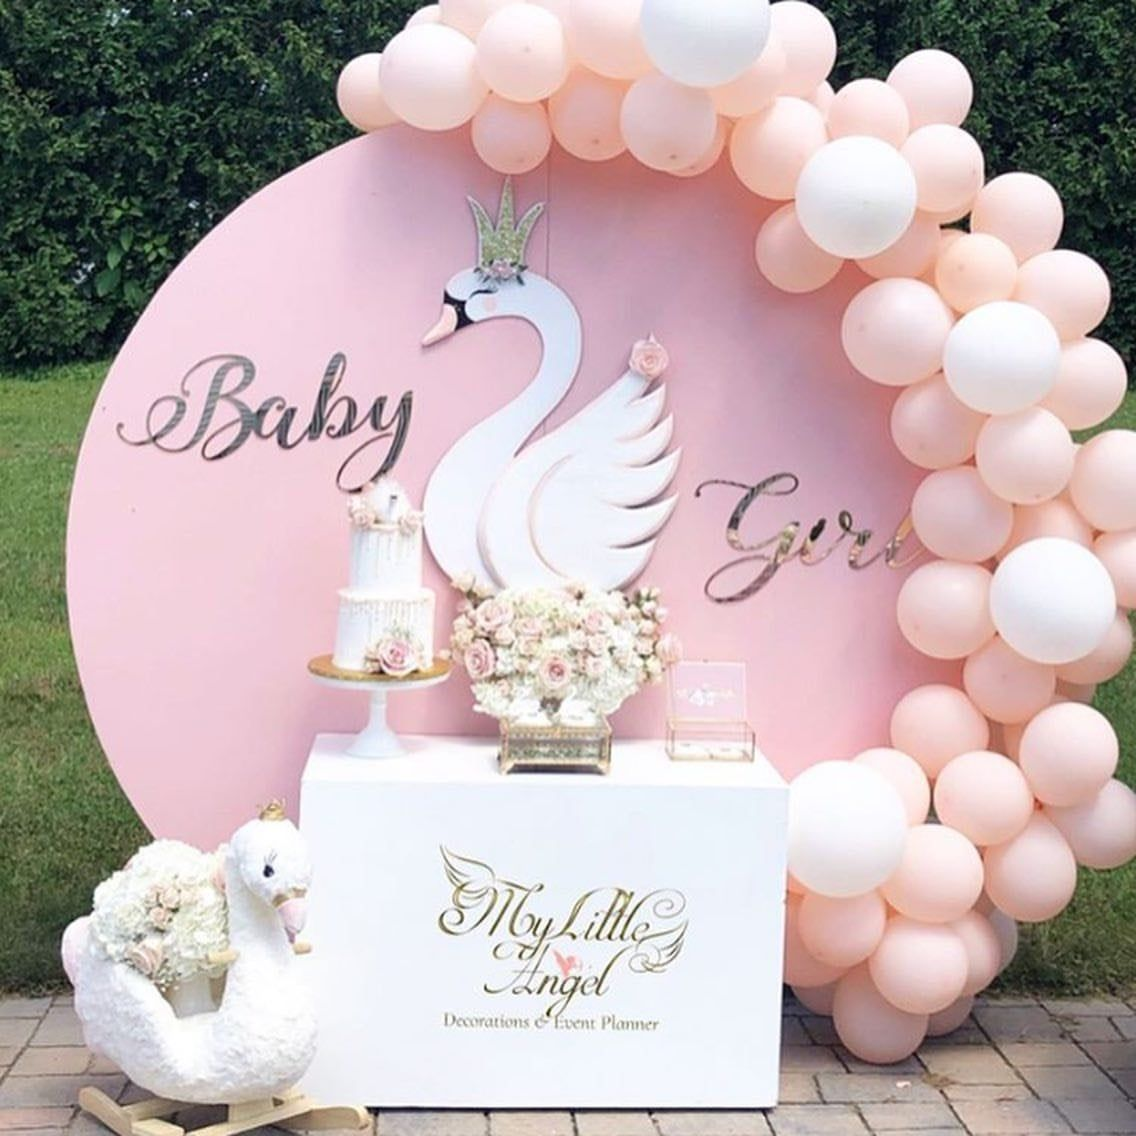 Swan Party Prop Backdrop Decor, Baby Shower Backdrop, Swan Party Cutout, Pastel Nursery Prop, Photo Prop, Swan Centerpiece Decor